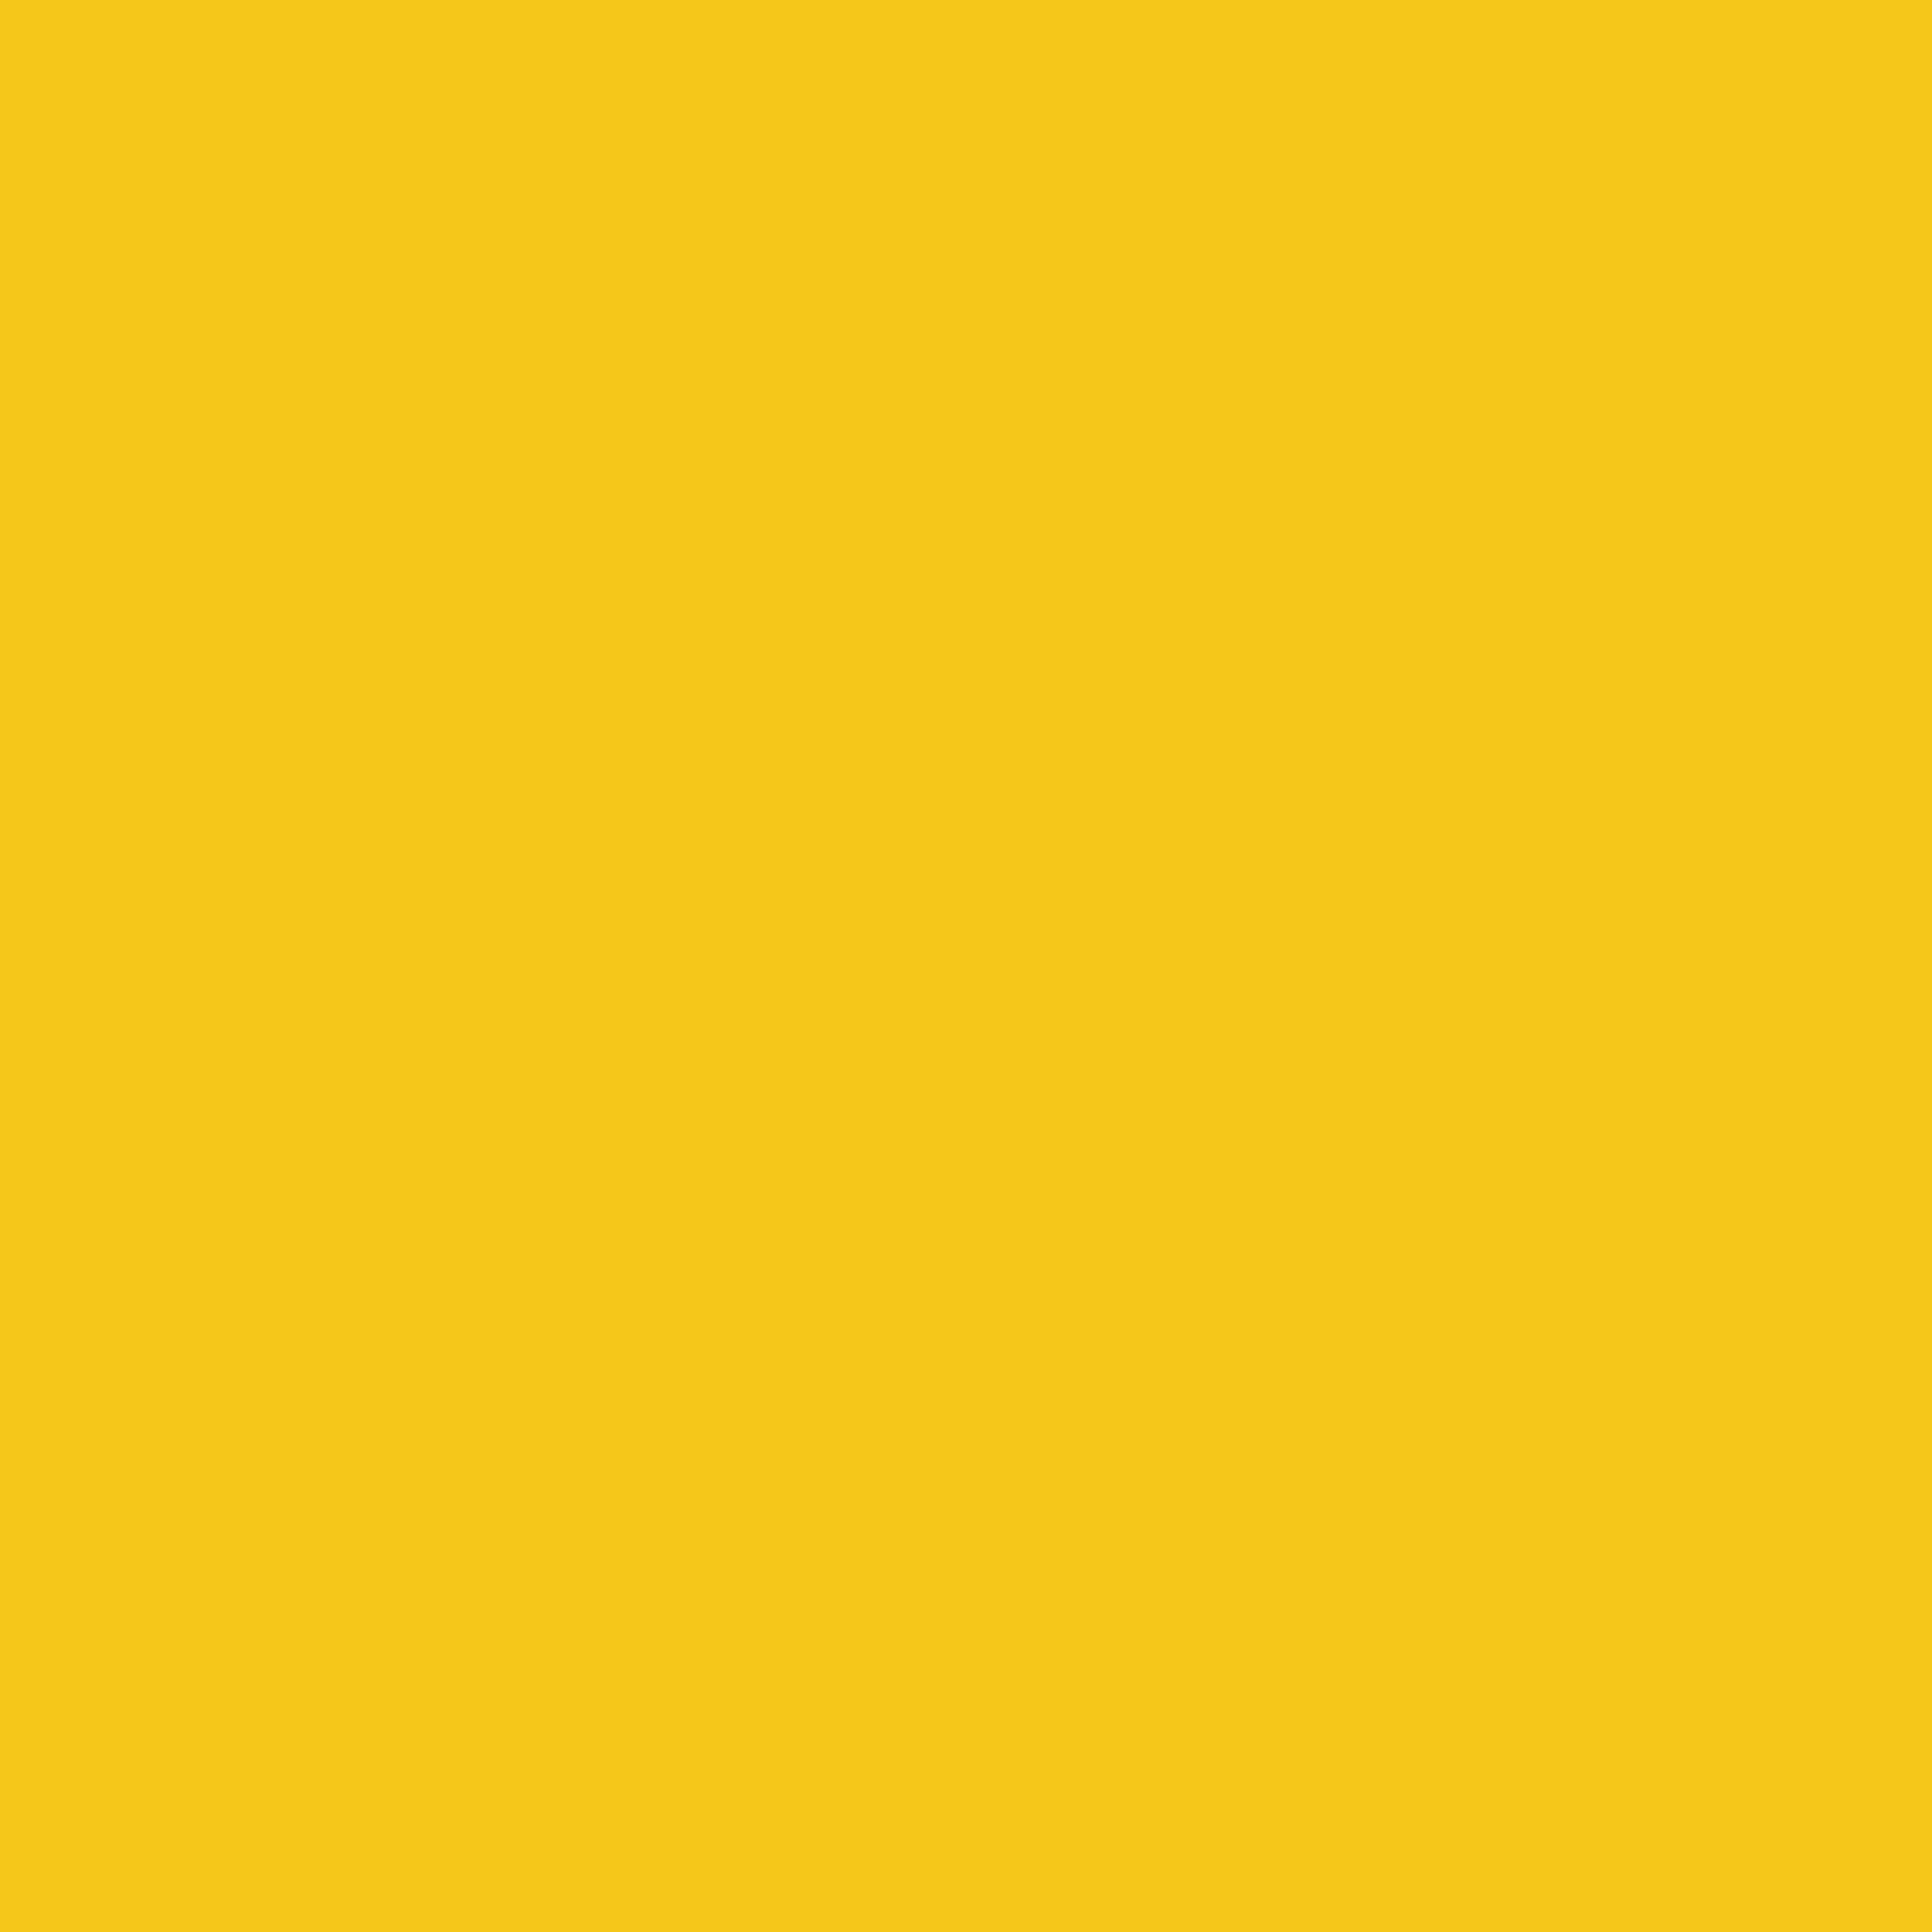 2048x2048 Deep Lemon Solid Color Background